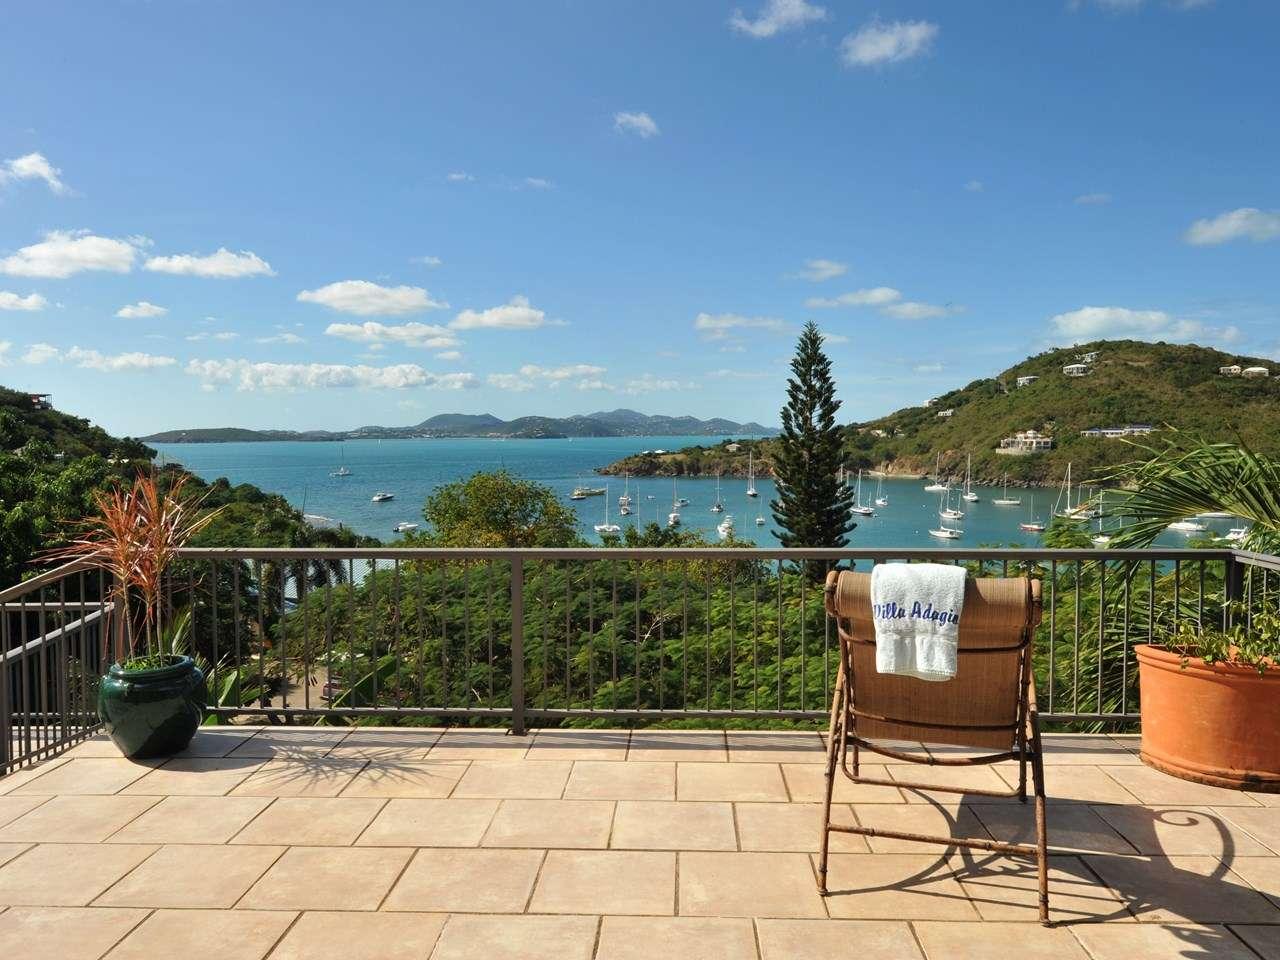 The view from Villa CT ADA (Adagio) at Great Cruz Bay, St. John, Pool, 3 Bedroom, 3 Bathroom, WiFi, WIMCO Villas